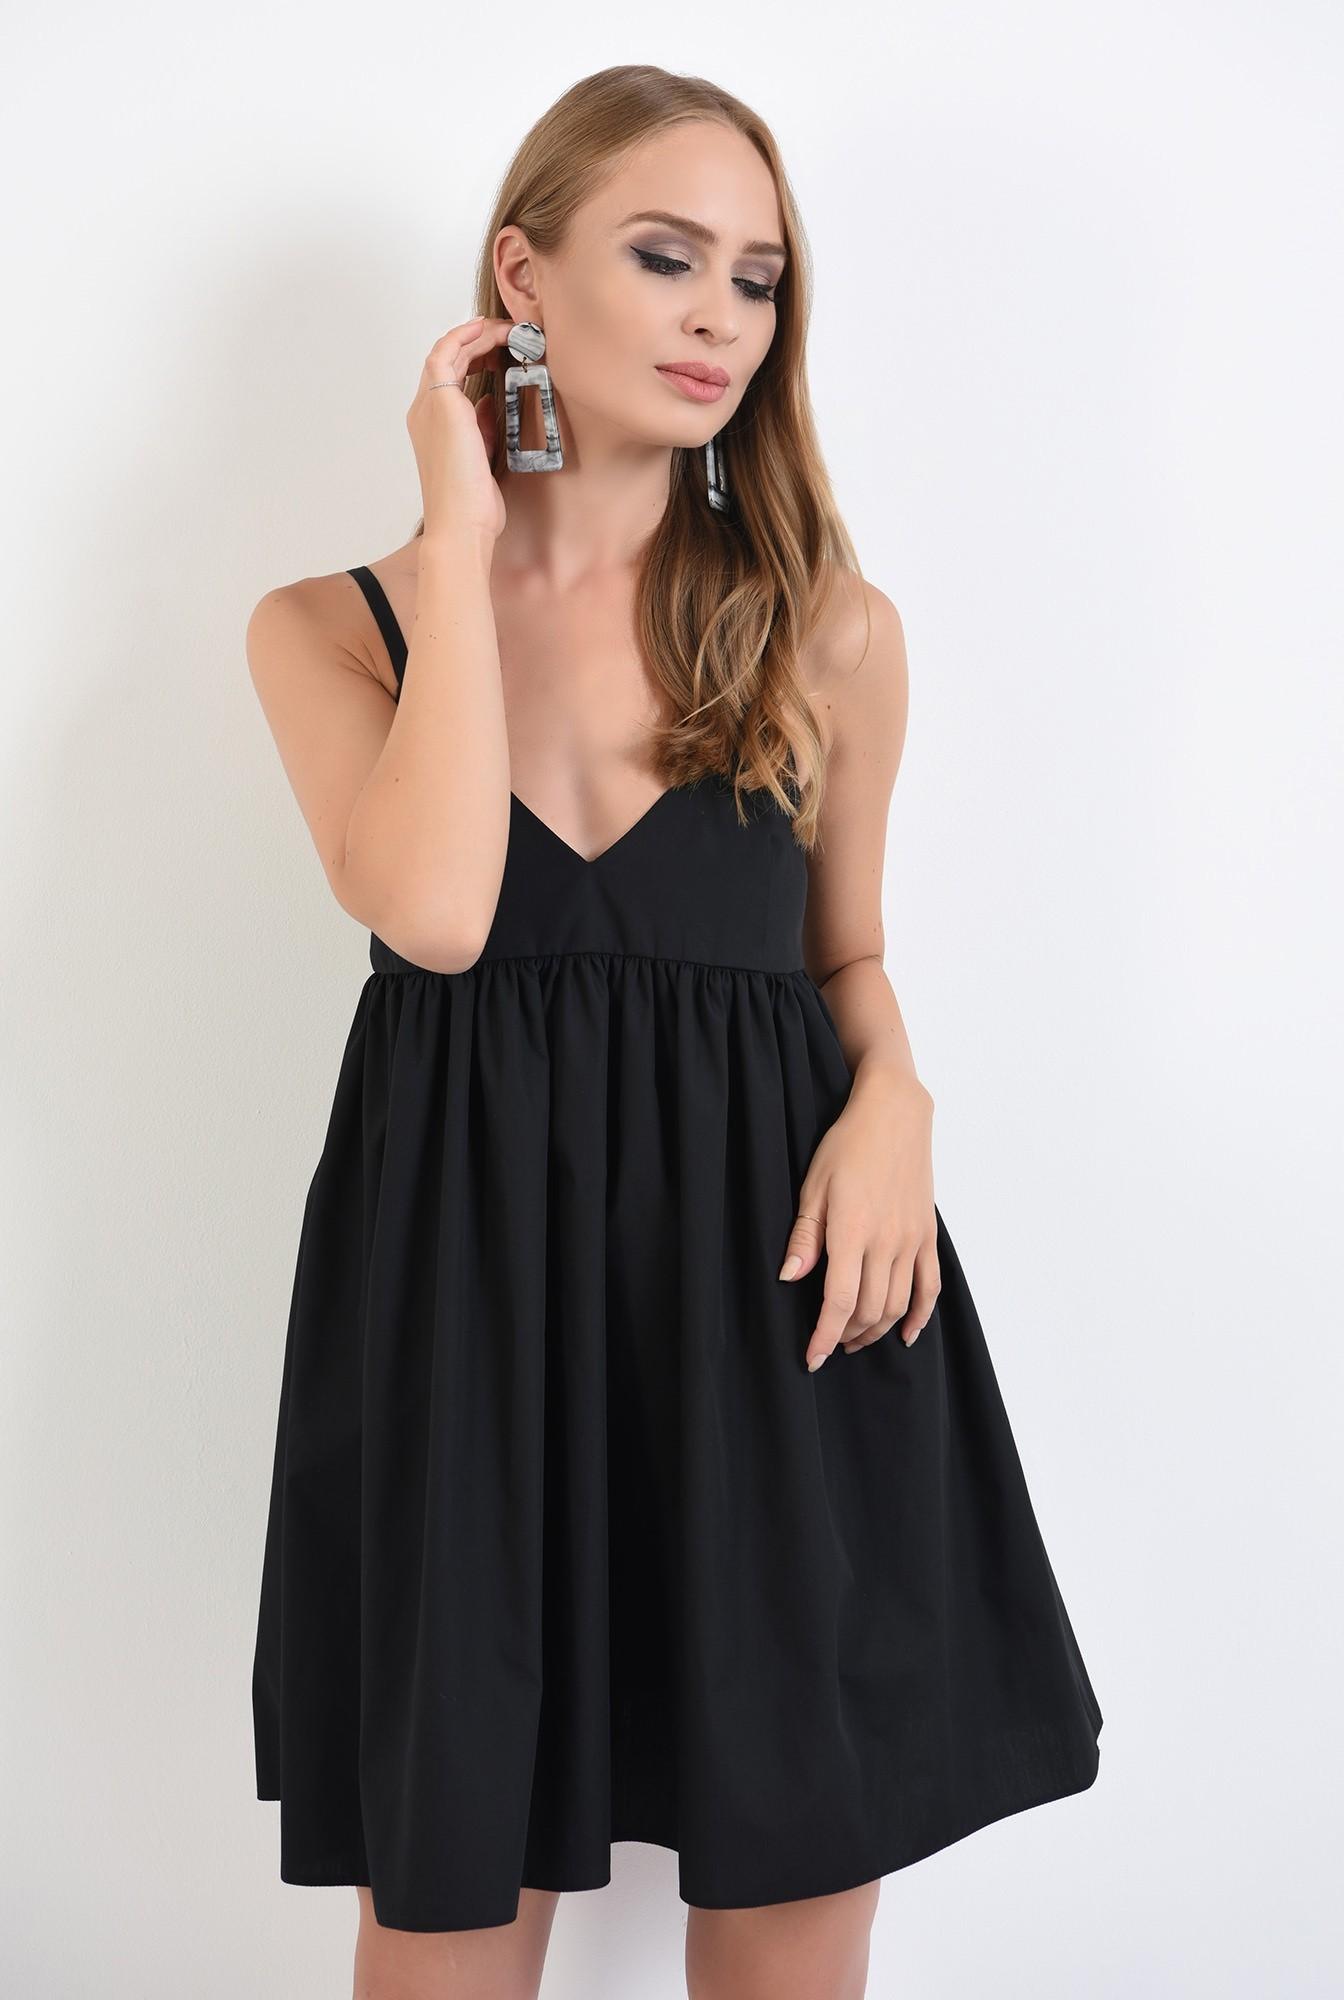 0 - 360 - rochie neagra, mini, evazata, cu bretele, anchior